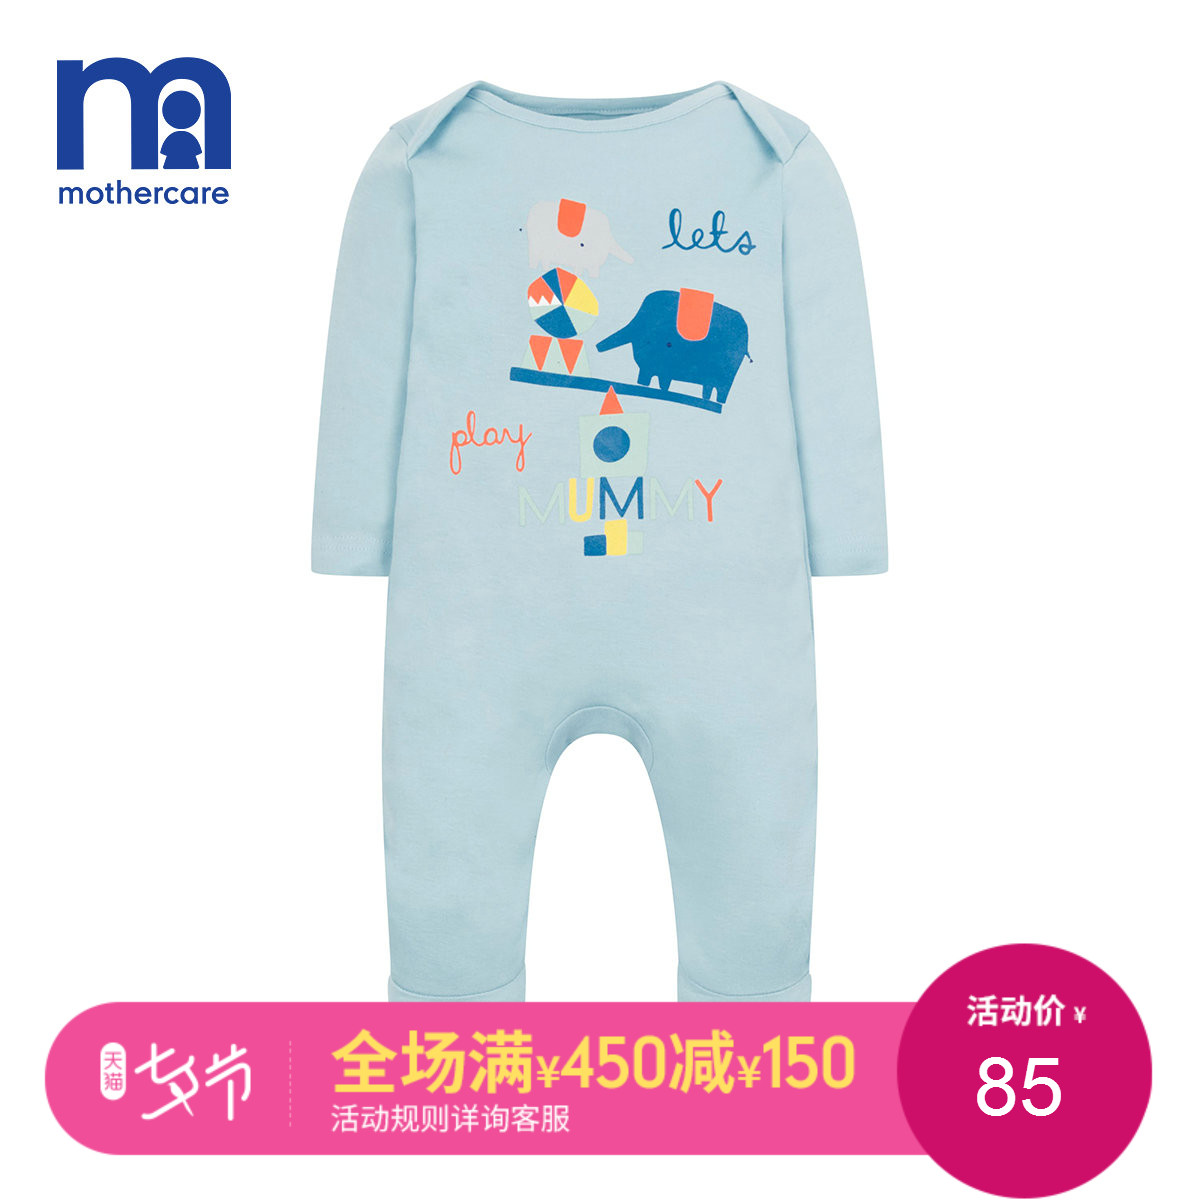 mothercare婴儿春装男新款棉质大象字母图案长袖男婴连脚套哈衣